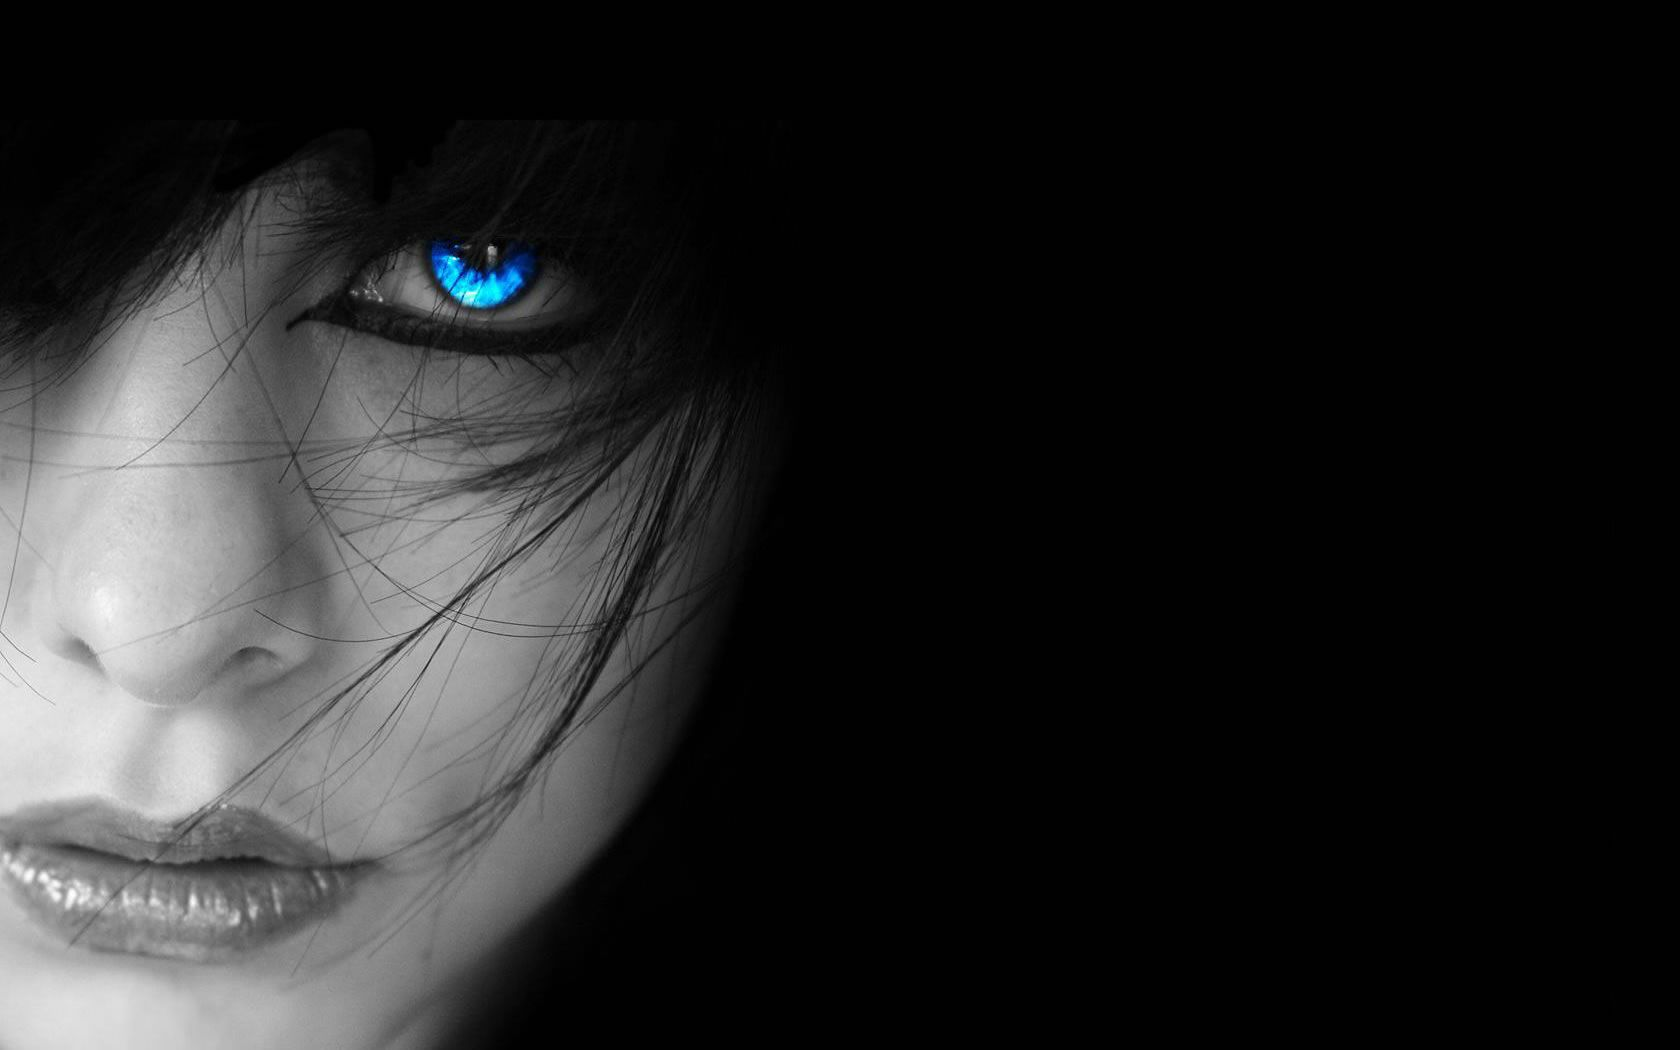 Girl With Blue Eyes At Night Wallpaper Free Free Beautiful Girl Eyes Wallpaper Beautiful Eyes Images Blue Eyed Girls